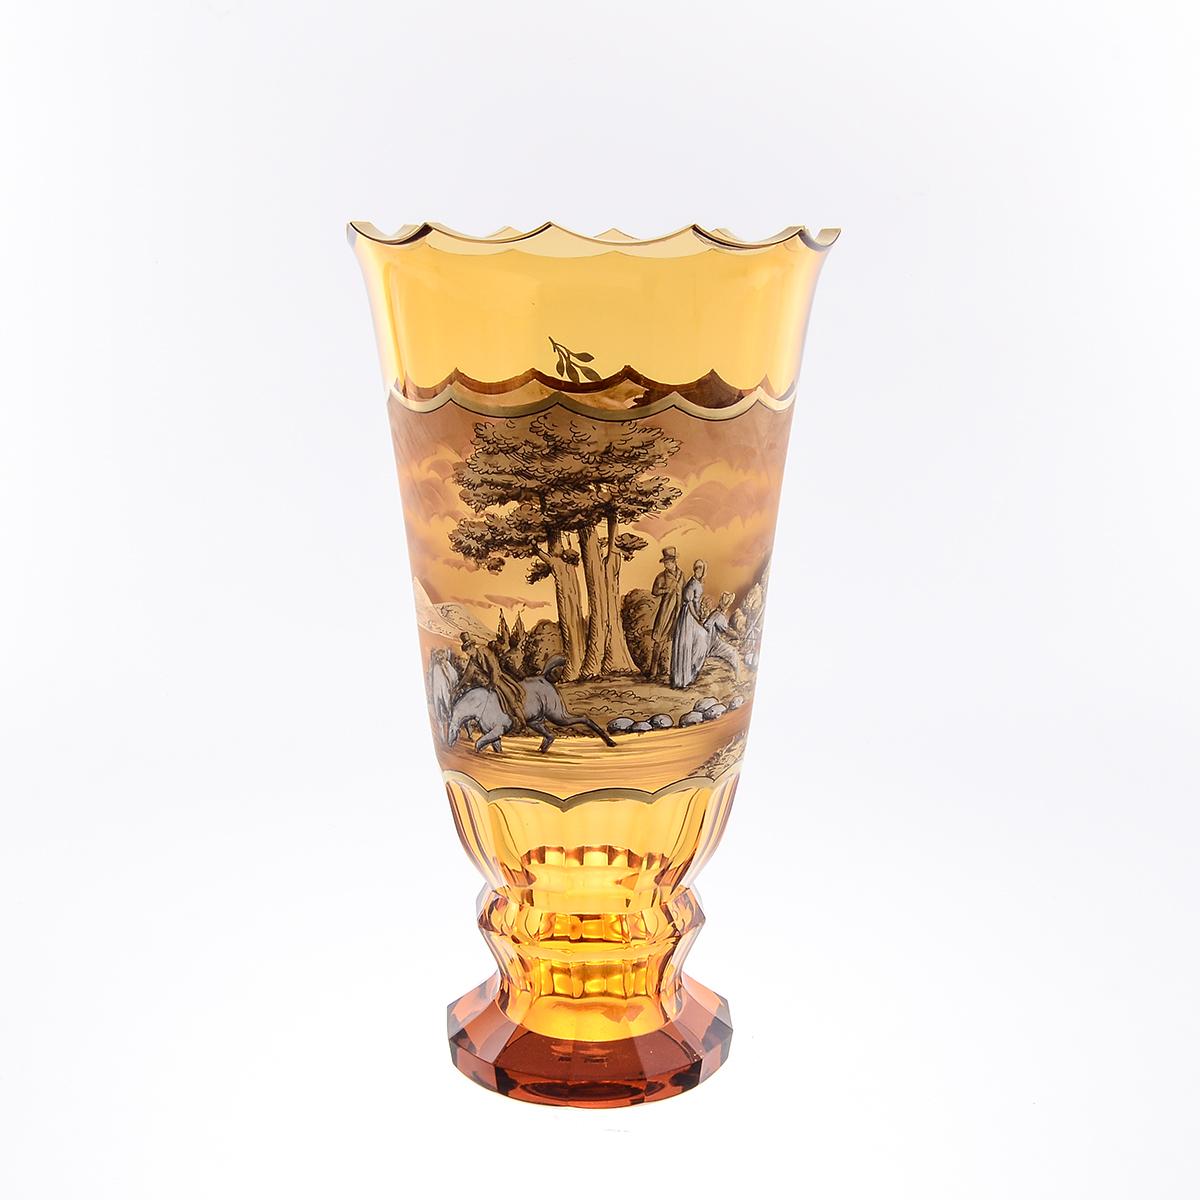 Ваза 29 см для цветов из стекла янтарного цвета от Egermann